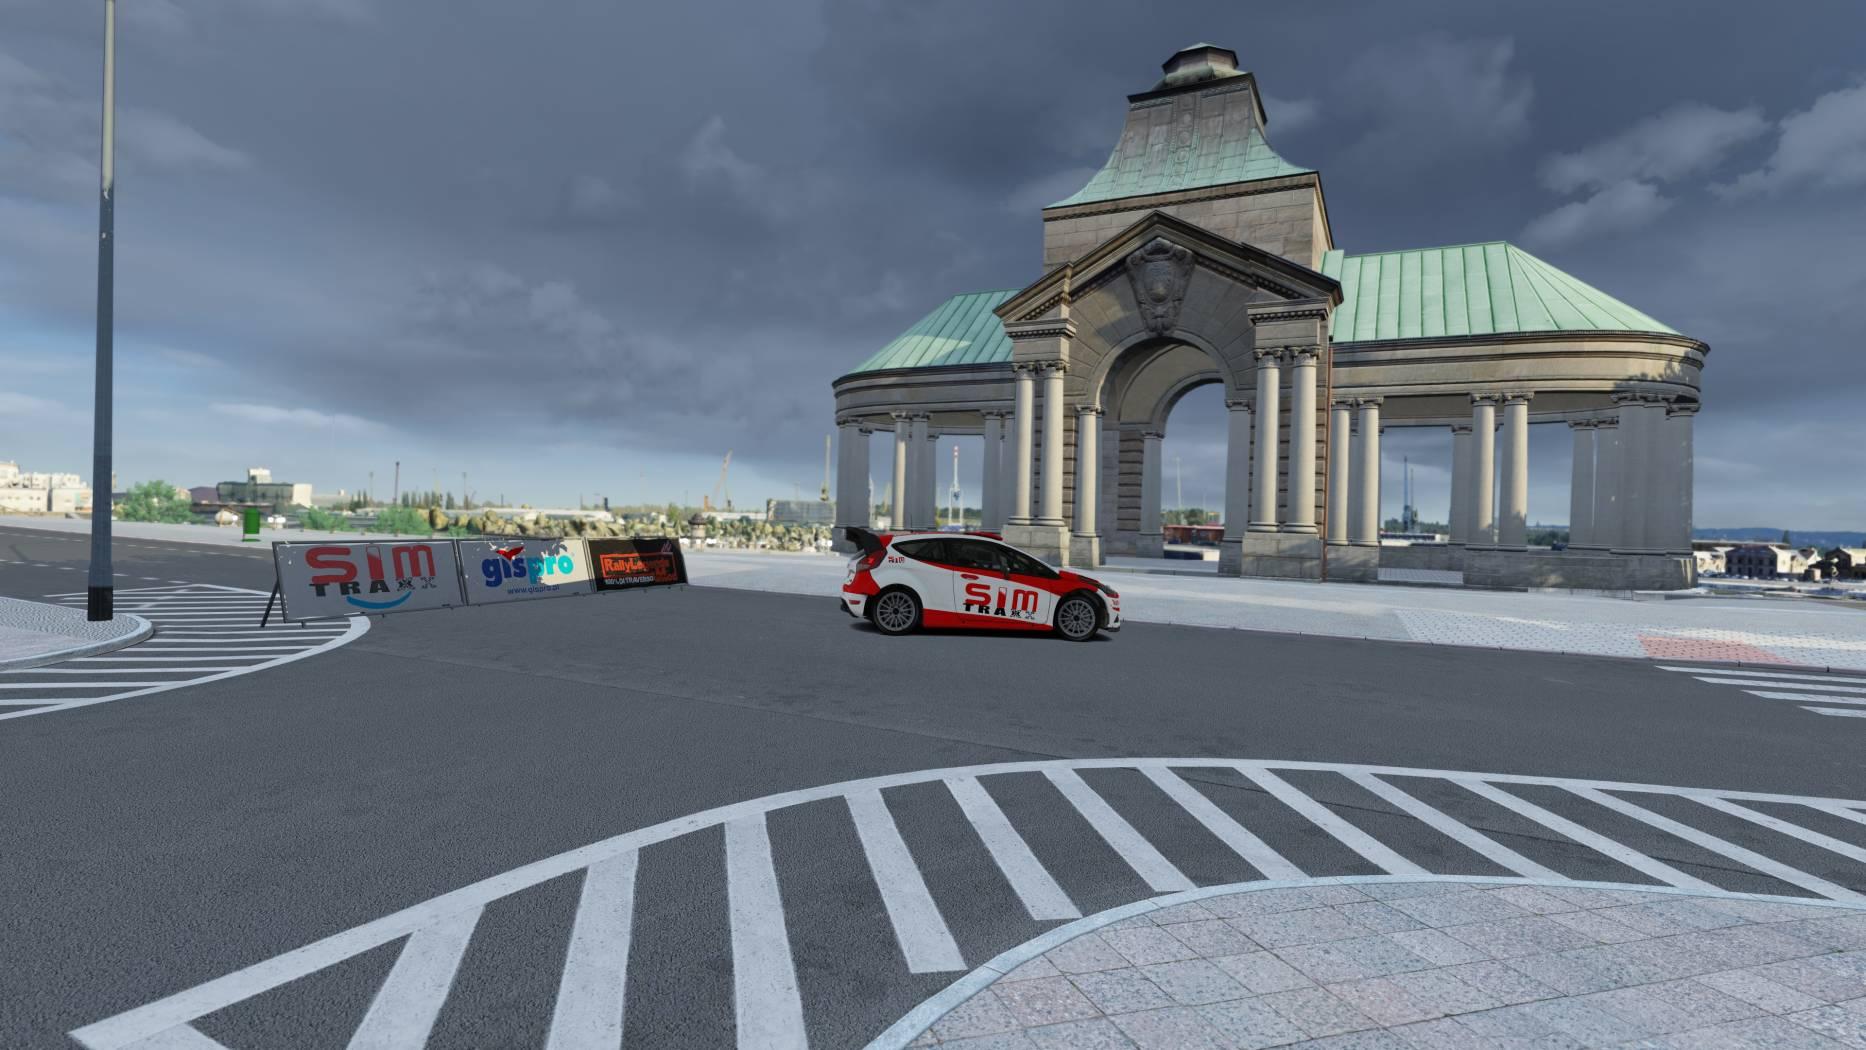 SIM TRAXX – Custom Made VReal (VIRTUAL REALITY) 3D SIM